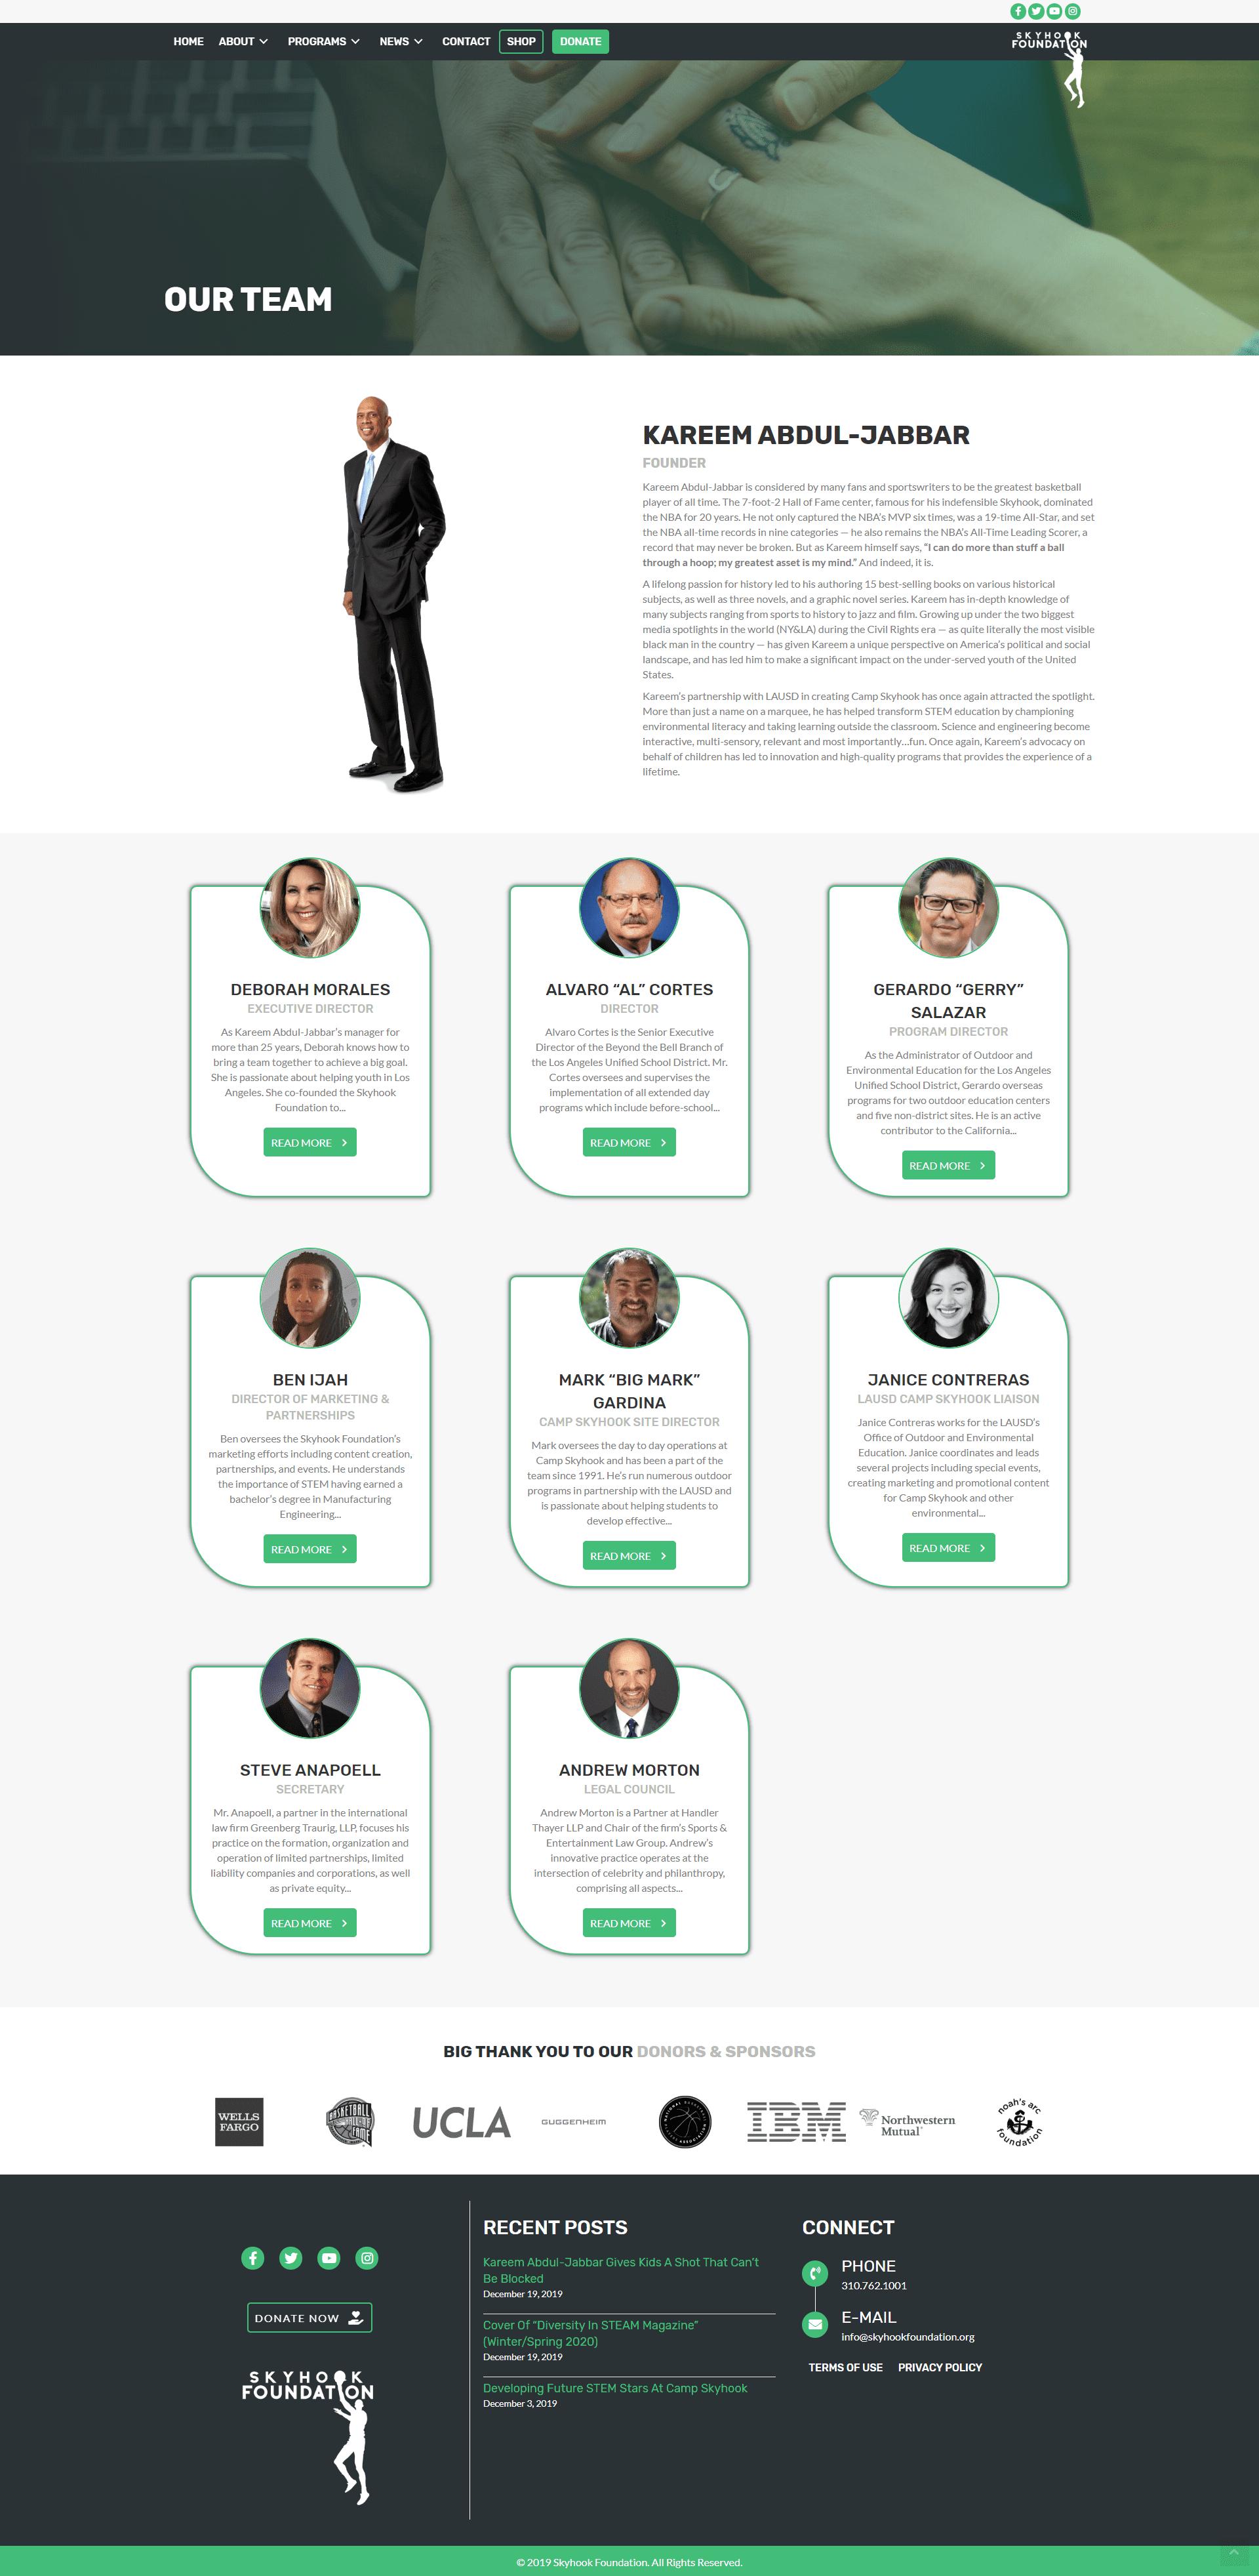 screencapture-skyhookfoundation-org-our-team